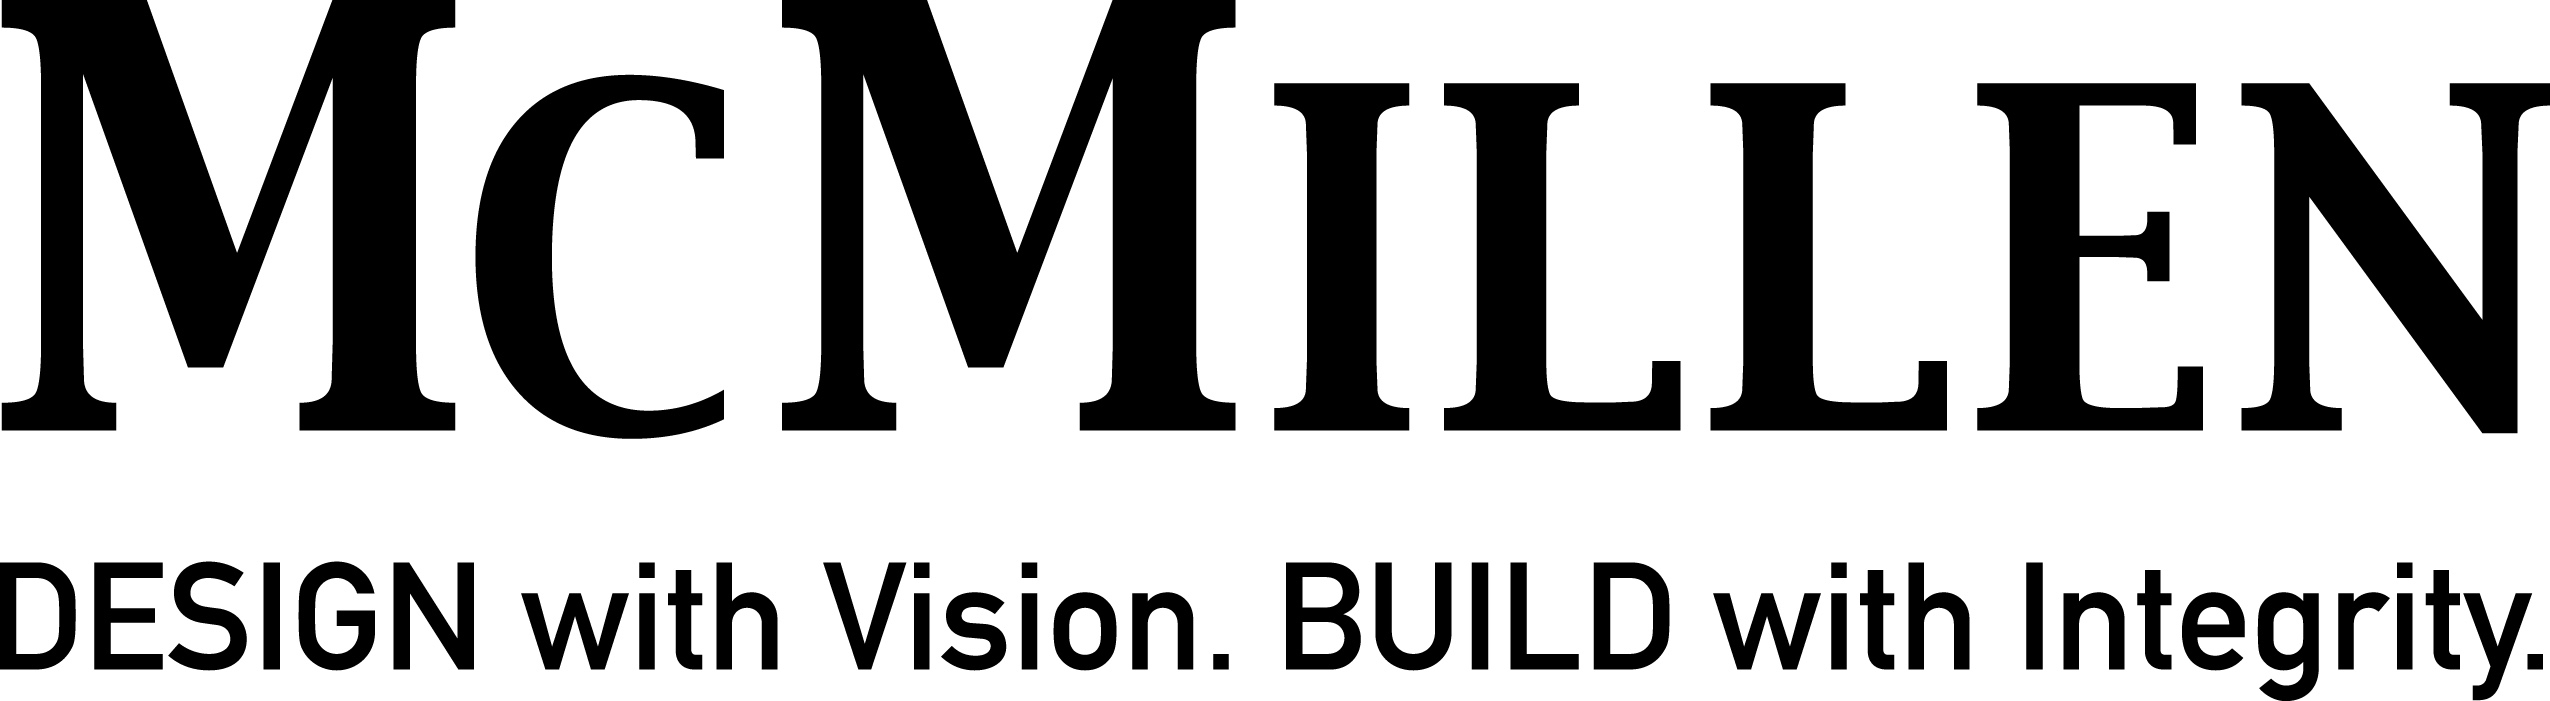 McMillen Jacobs Associates, Inc.